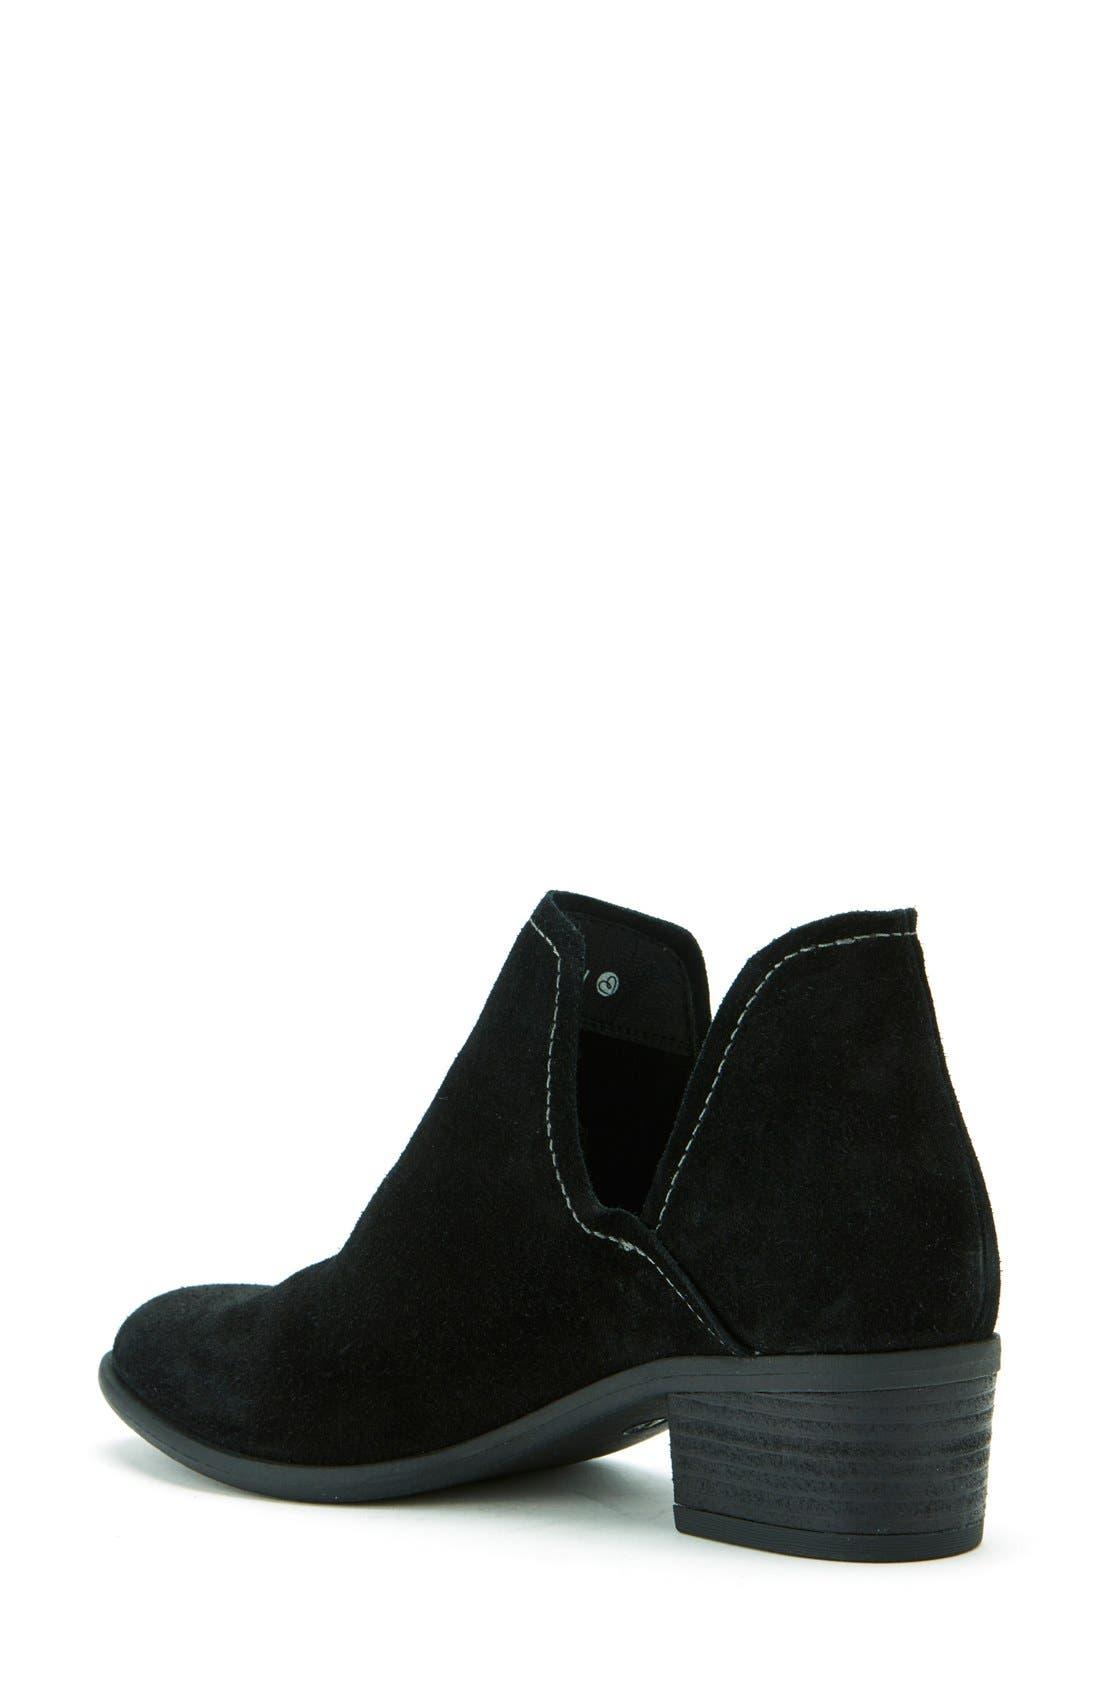 'Marcella' Waterproof  Boot,                             Alternate thumbnail 2, color,                             Black Suede